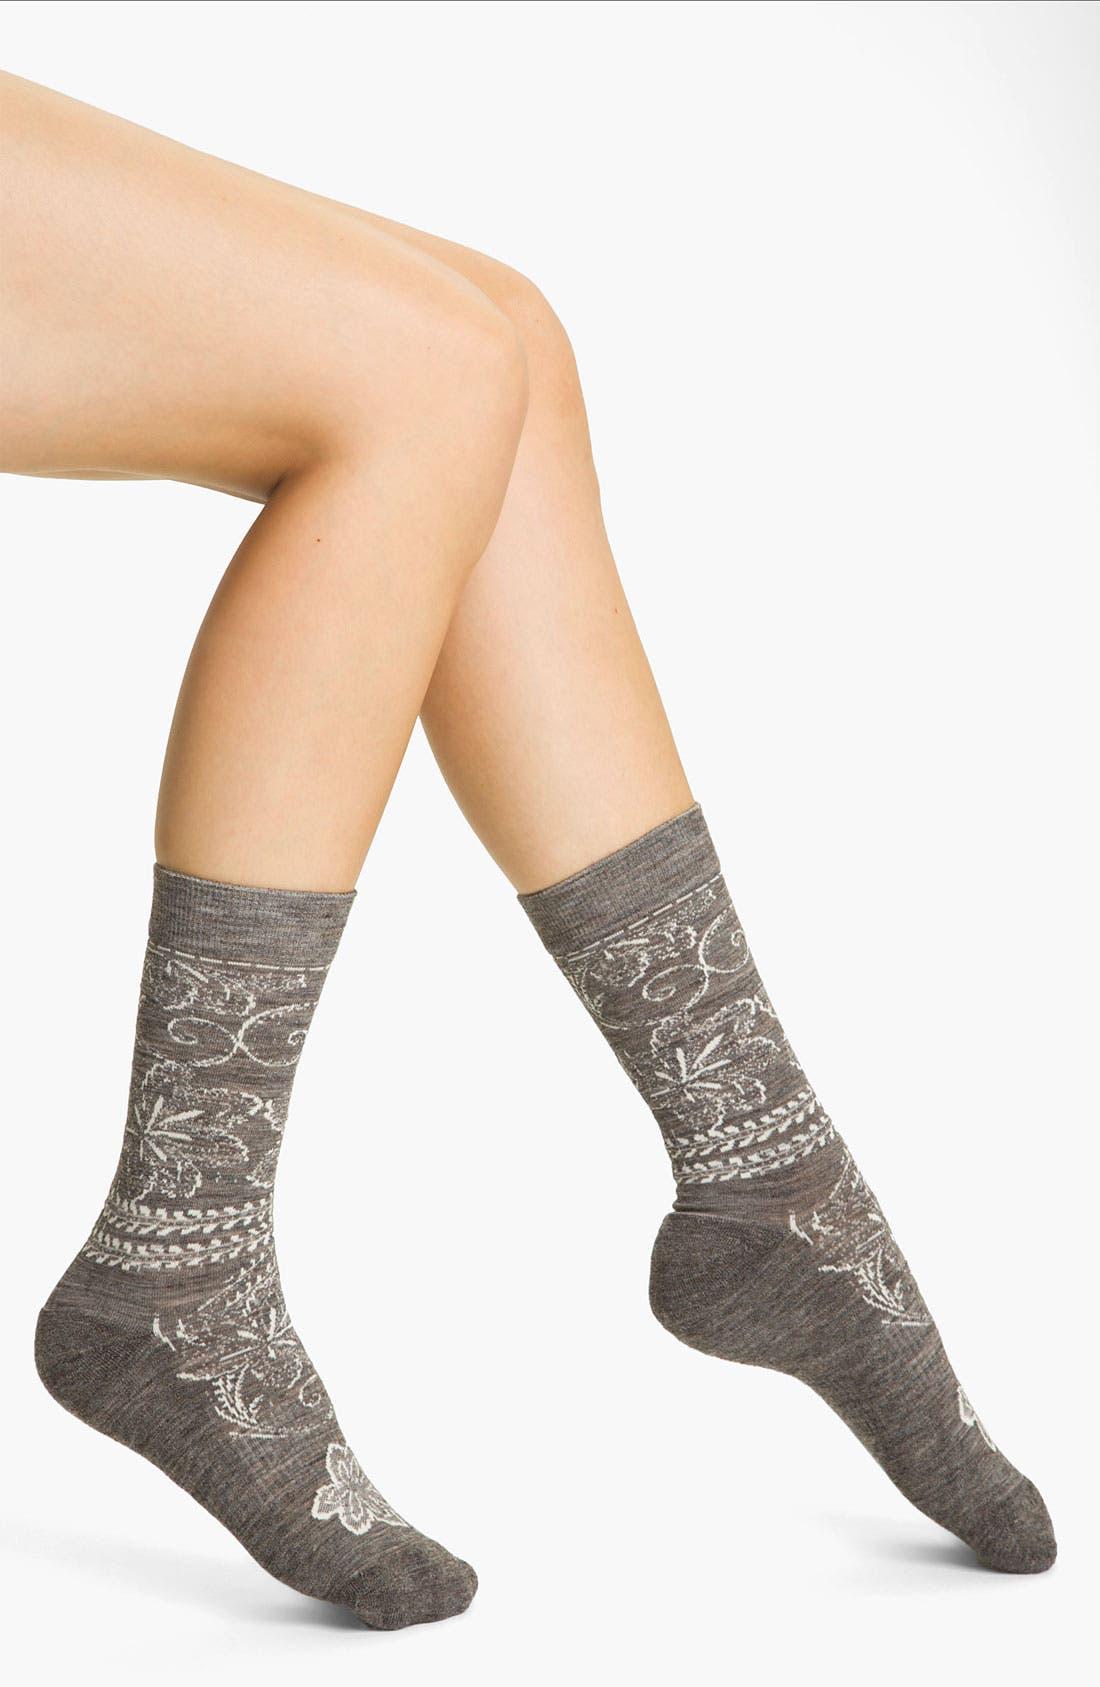 Alternate Image 1 Selected - Smartwool 'Floral Scroll' Socks